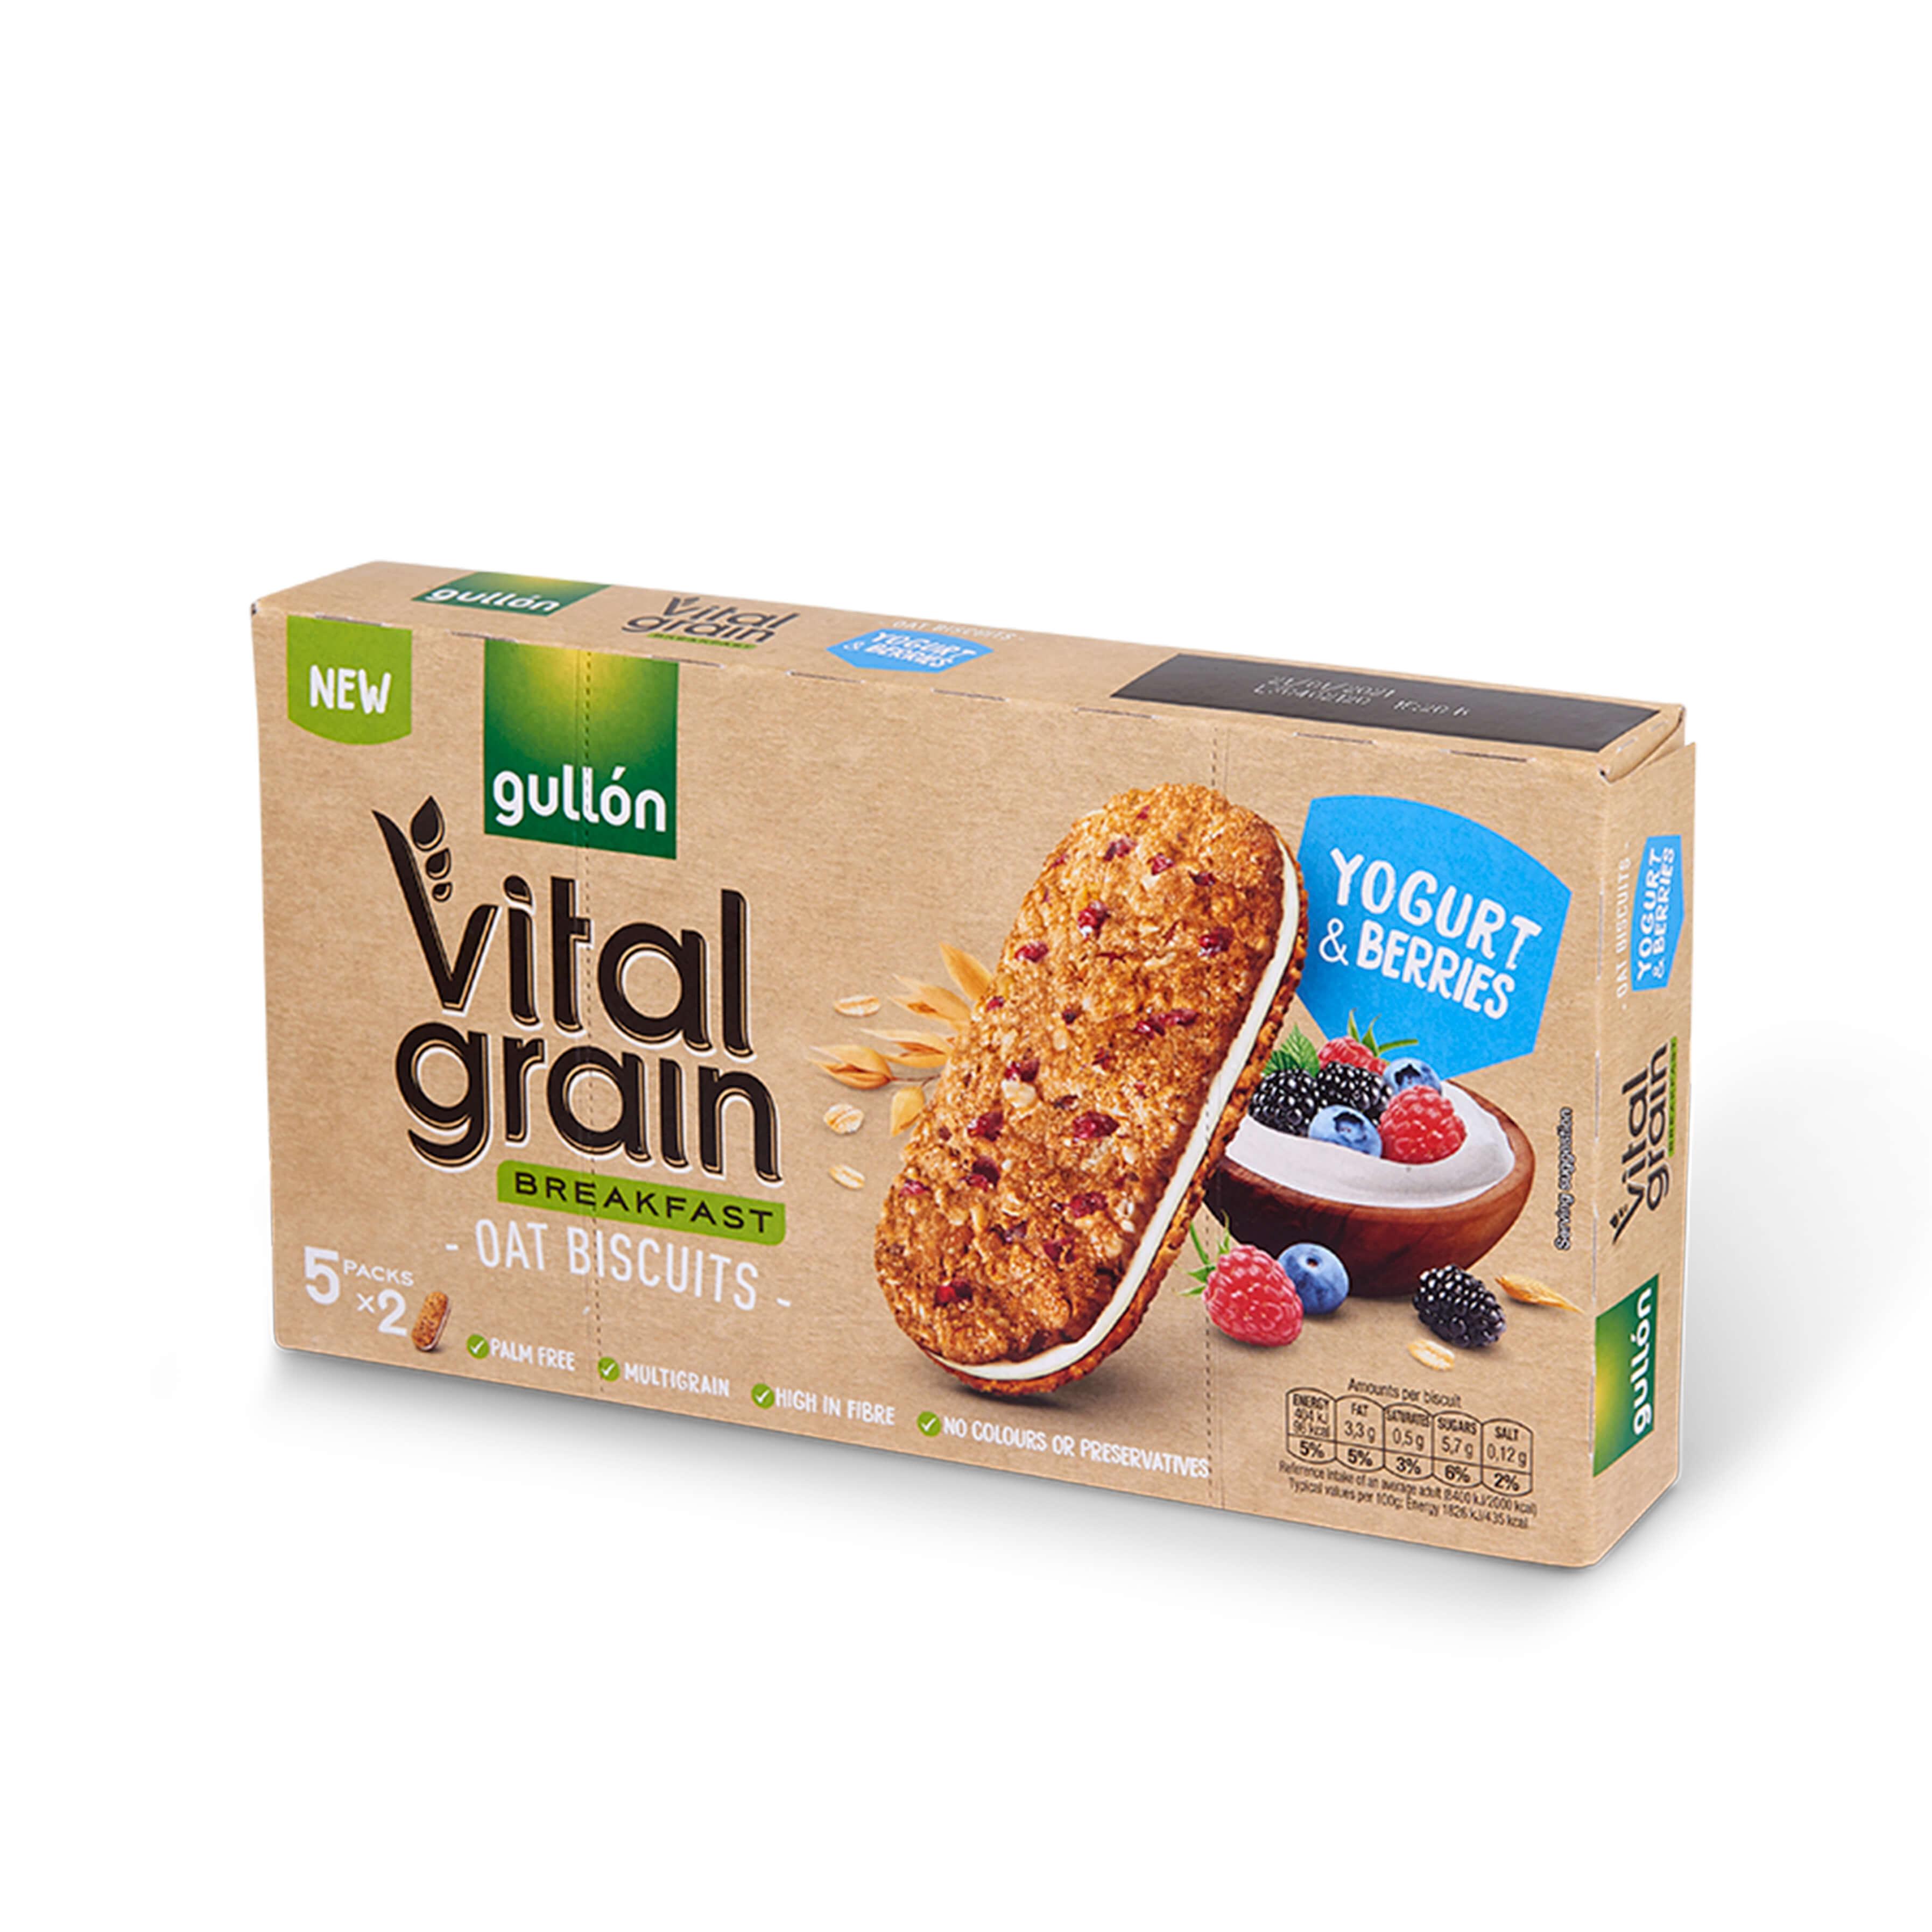 vitalgran_biscuit-yogurt-berries_01_en